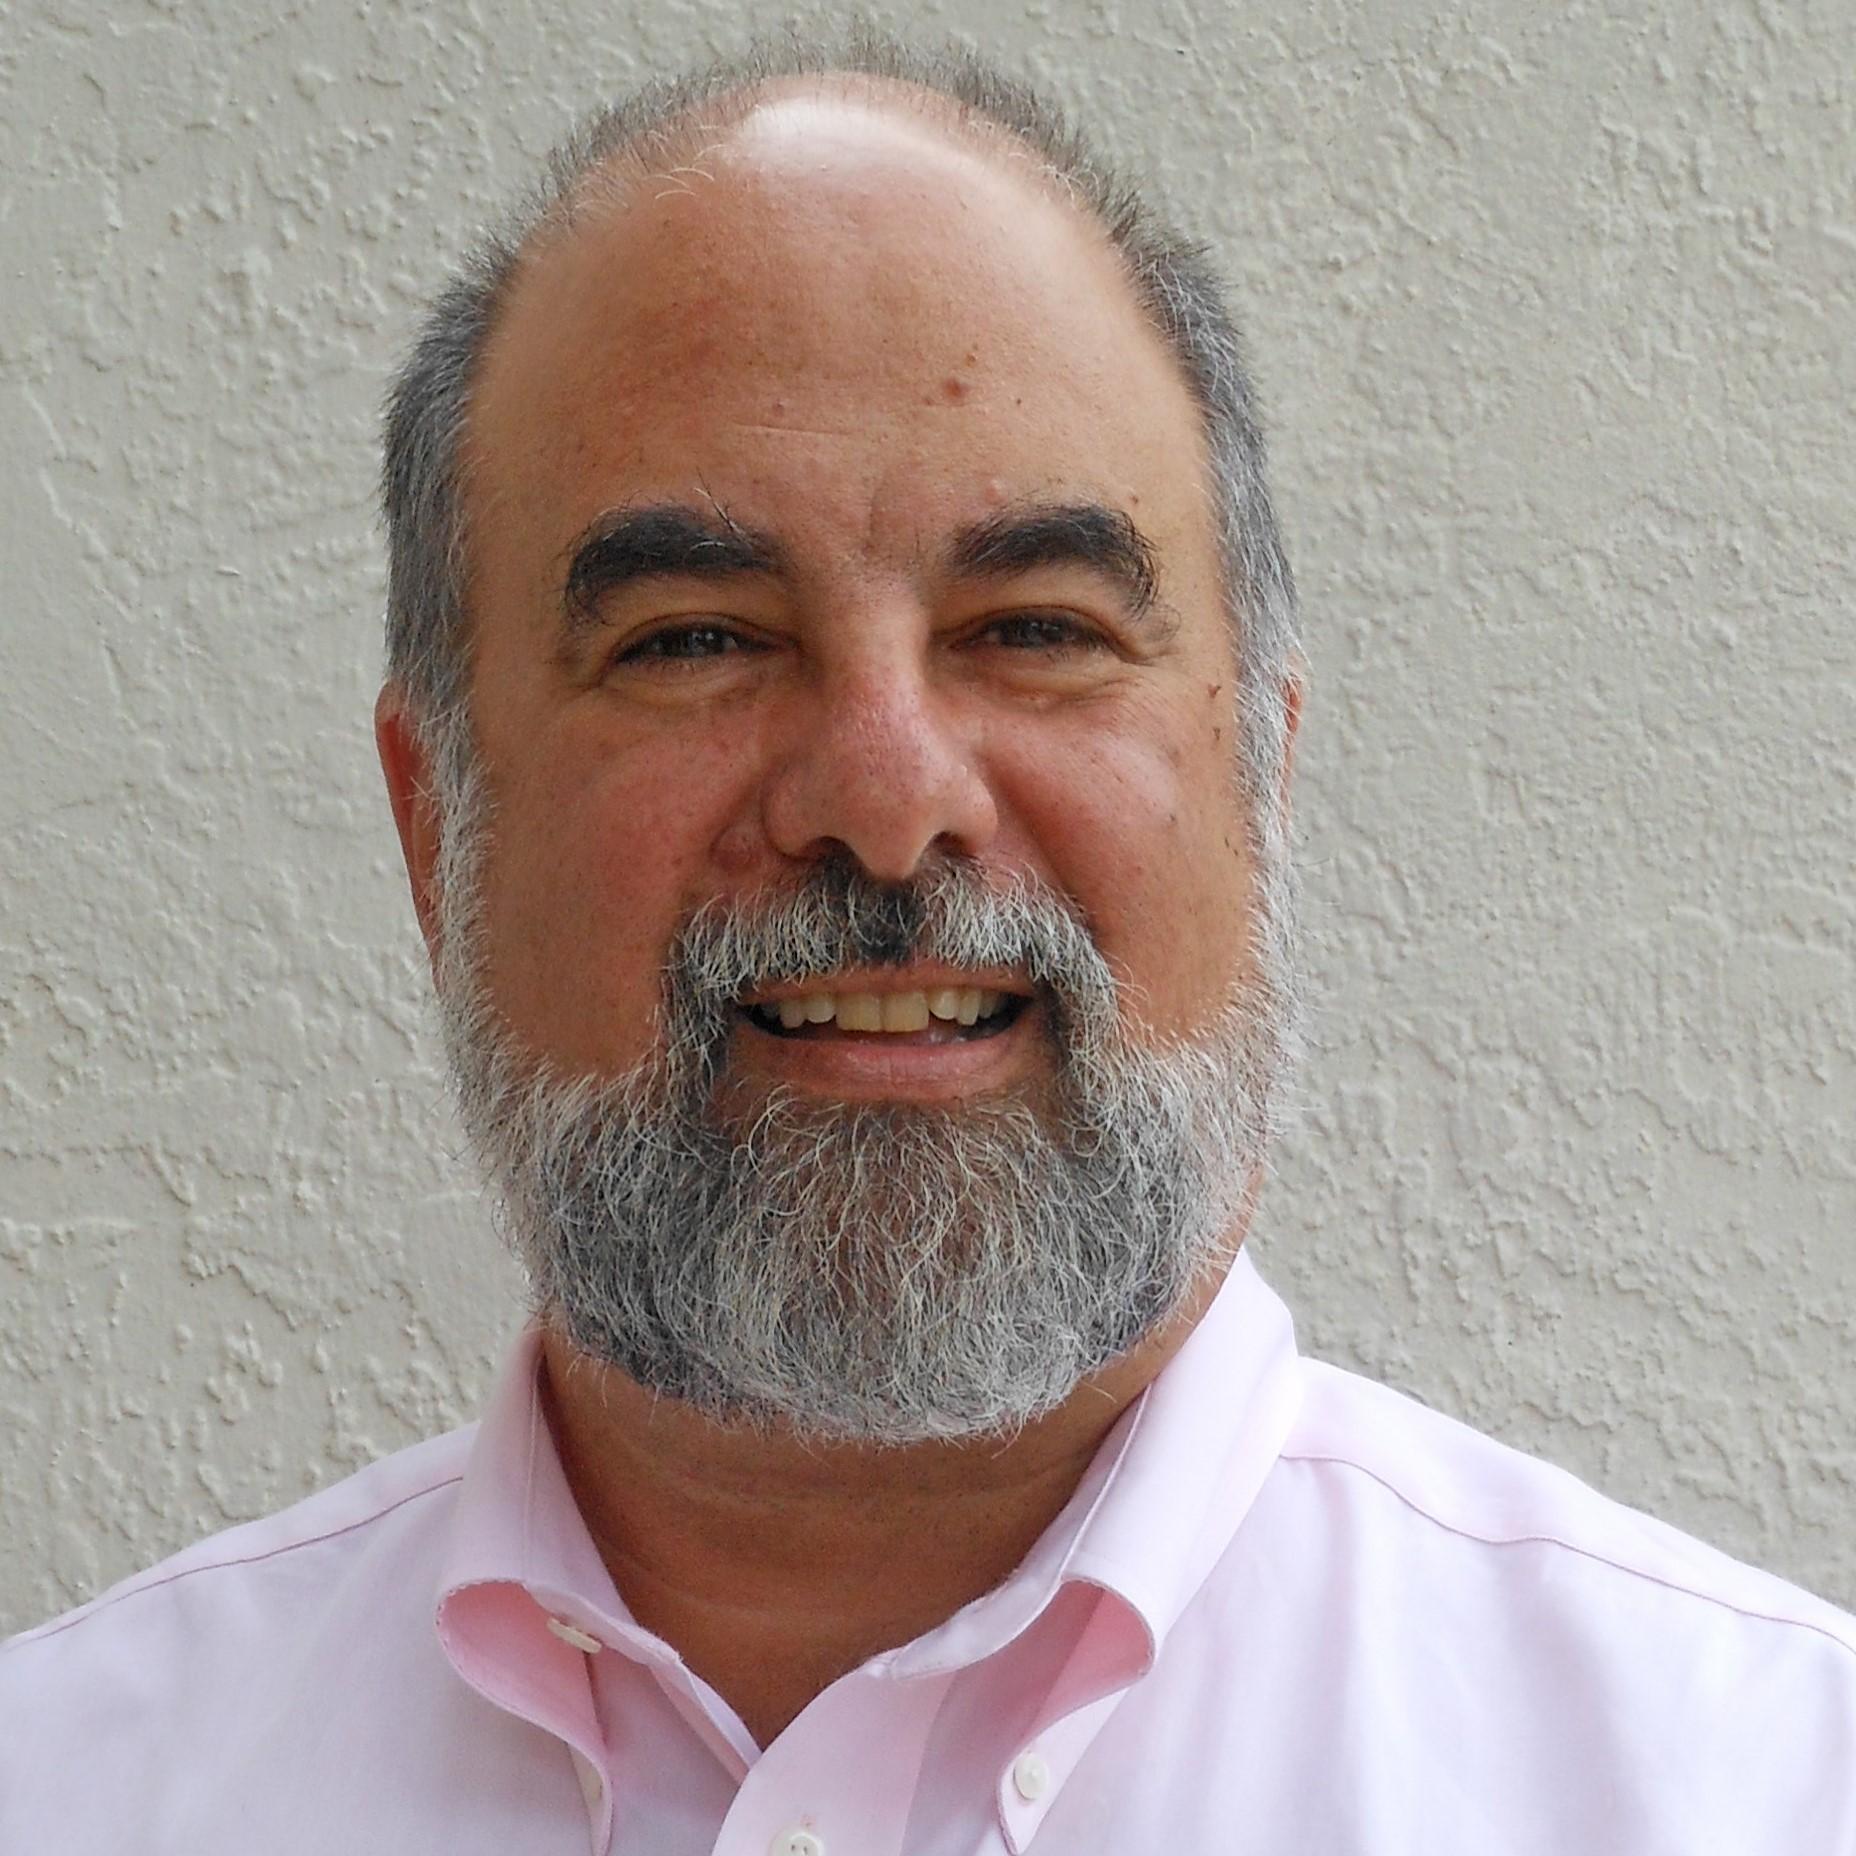 Andrew Scher, Principal Advisor